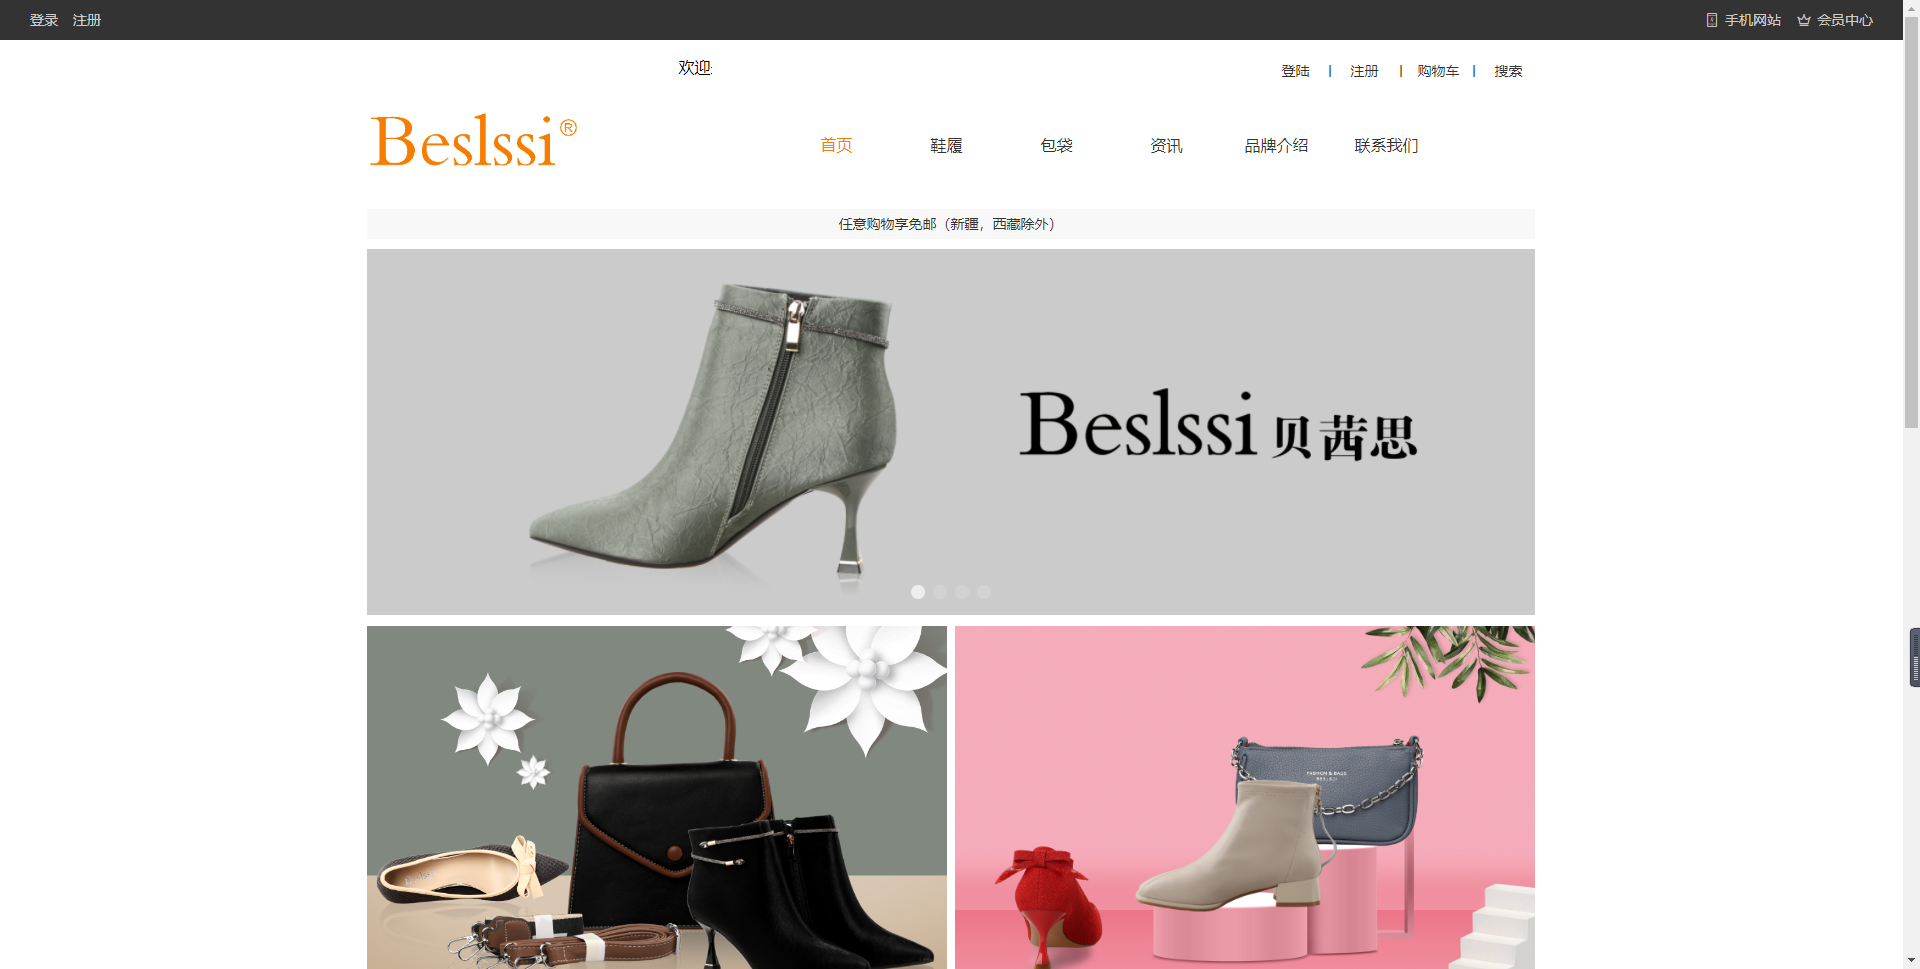 Beslssi官方旗舰店